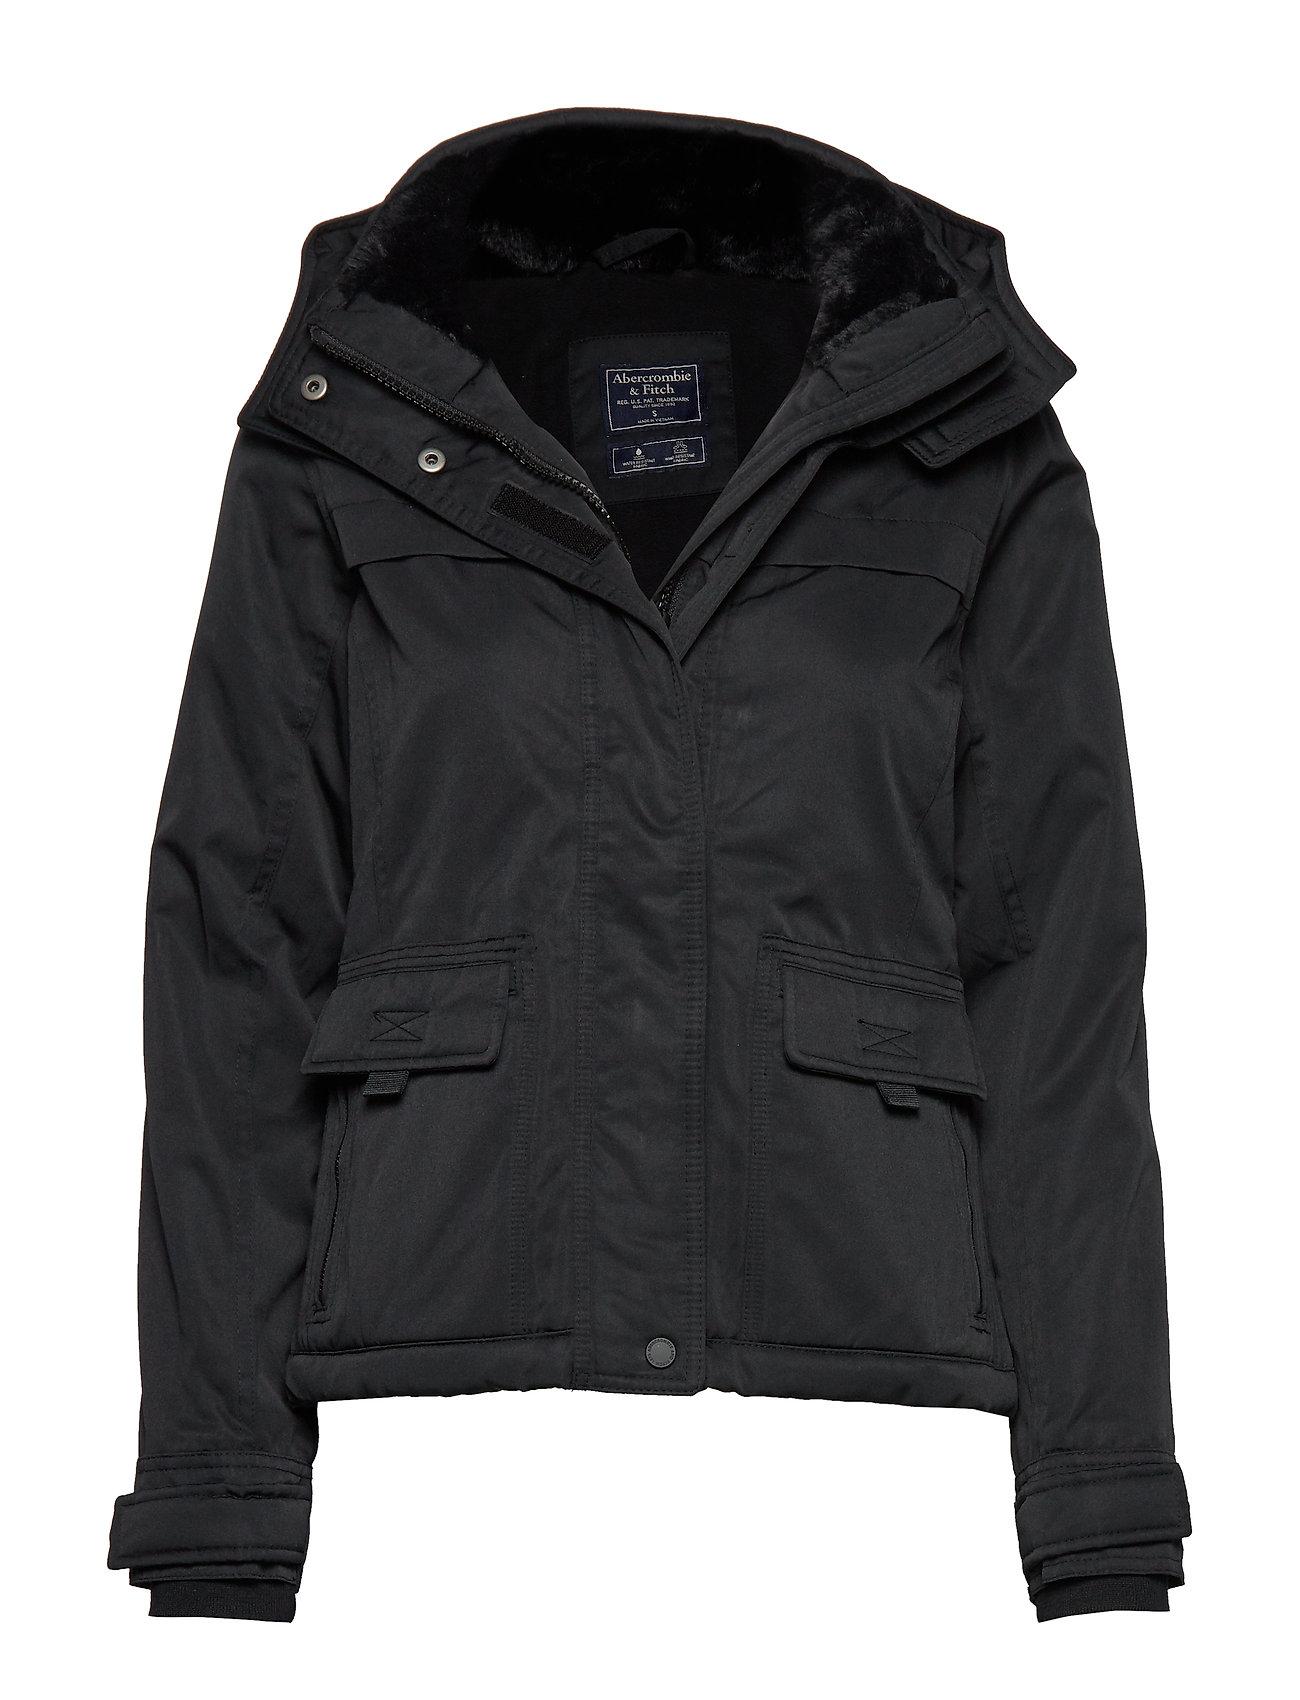 Abercrombie & Fitch Tech Jacket - BLACK DD